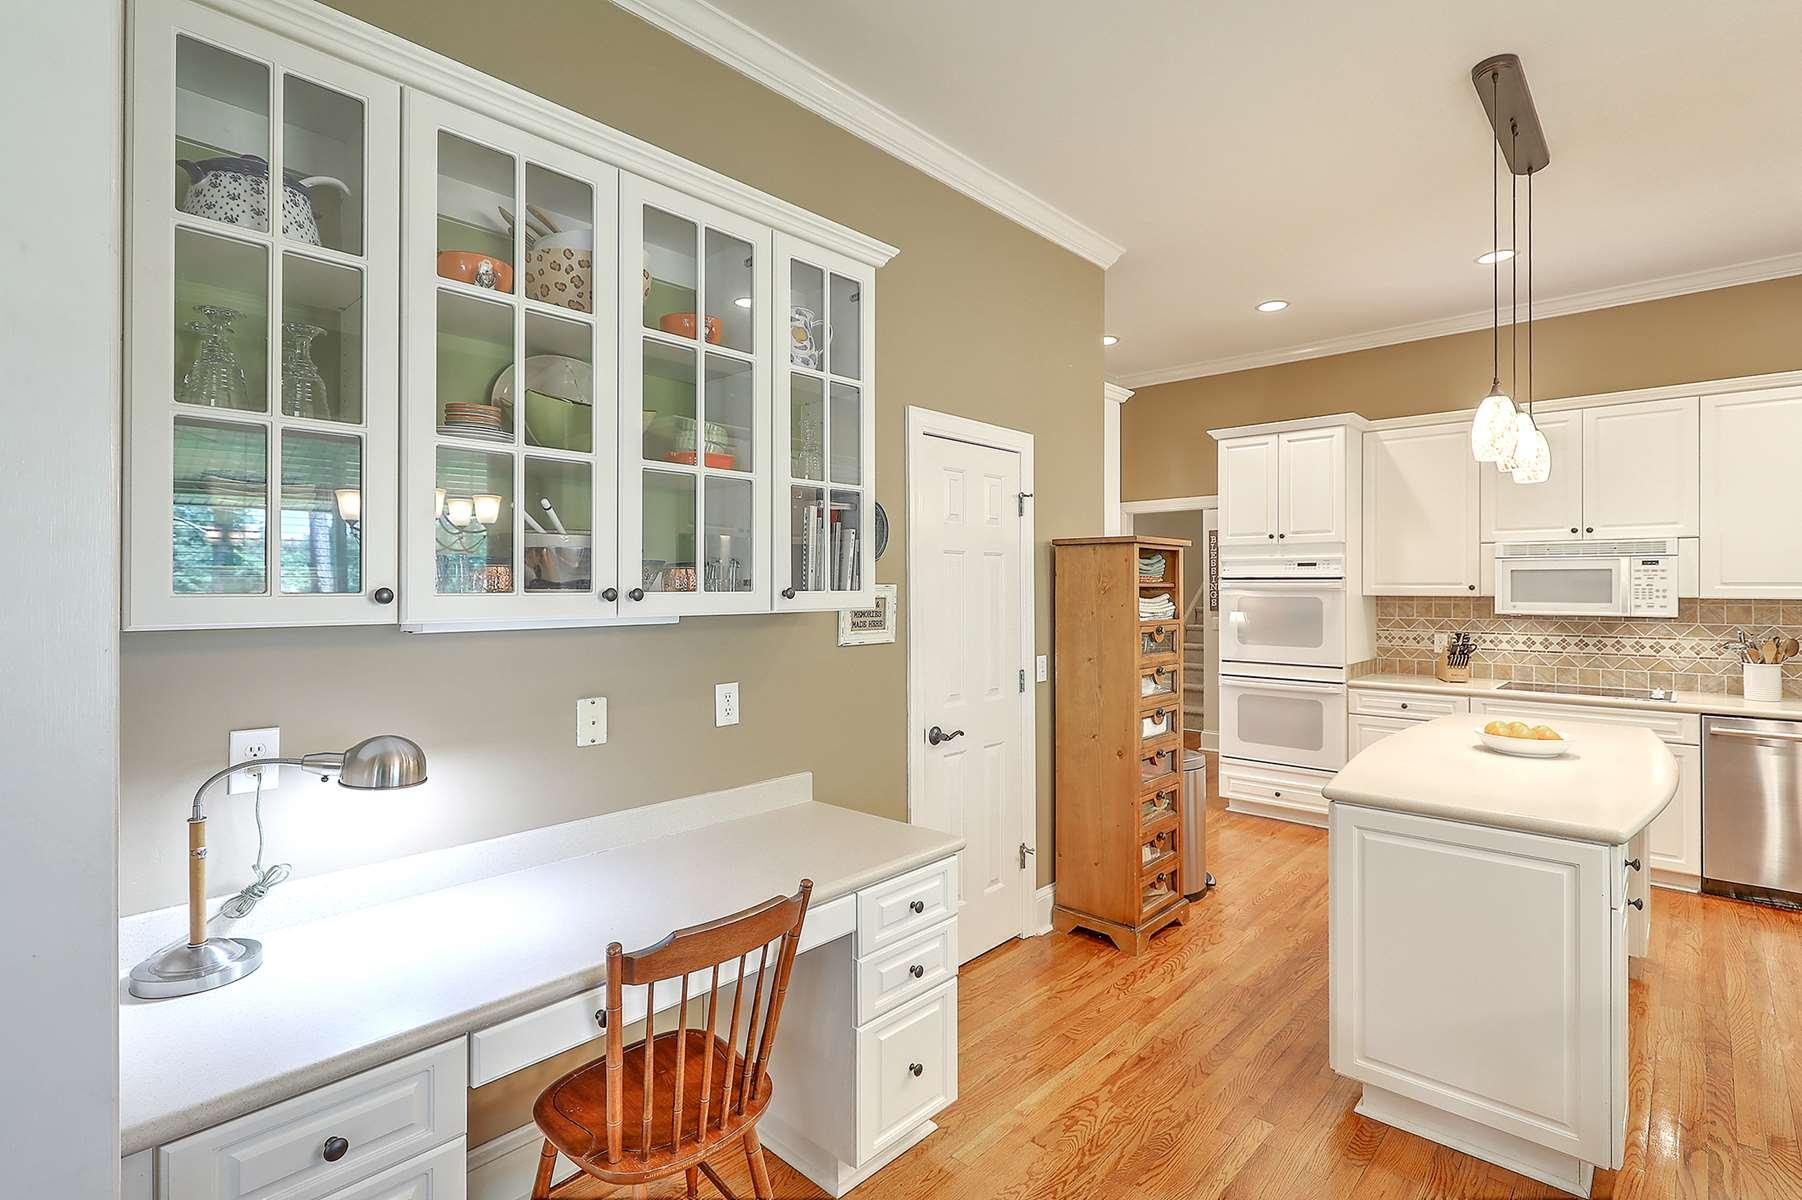 Dunes West Homes For Sale - 2961 Pignatelli, Mount Pleasant, SC - 9